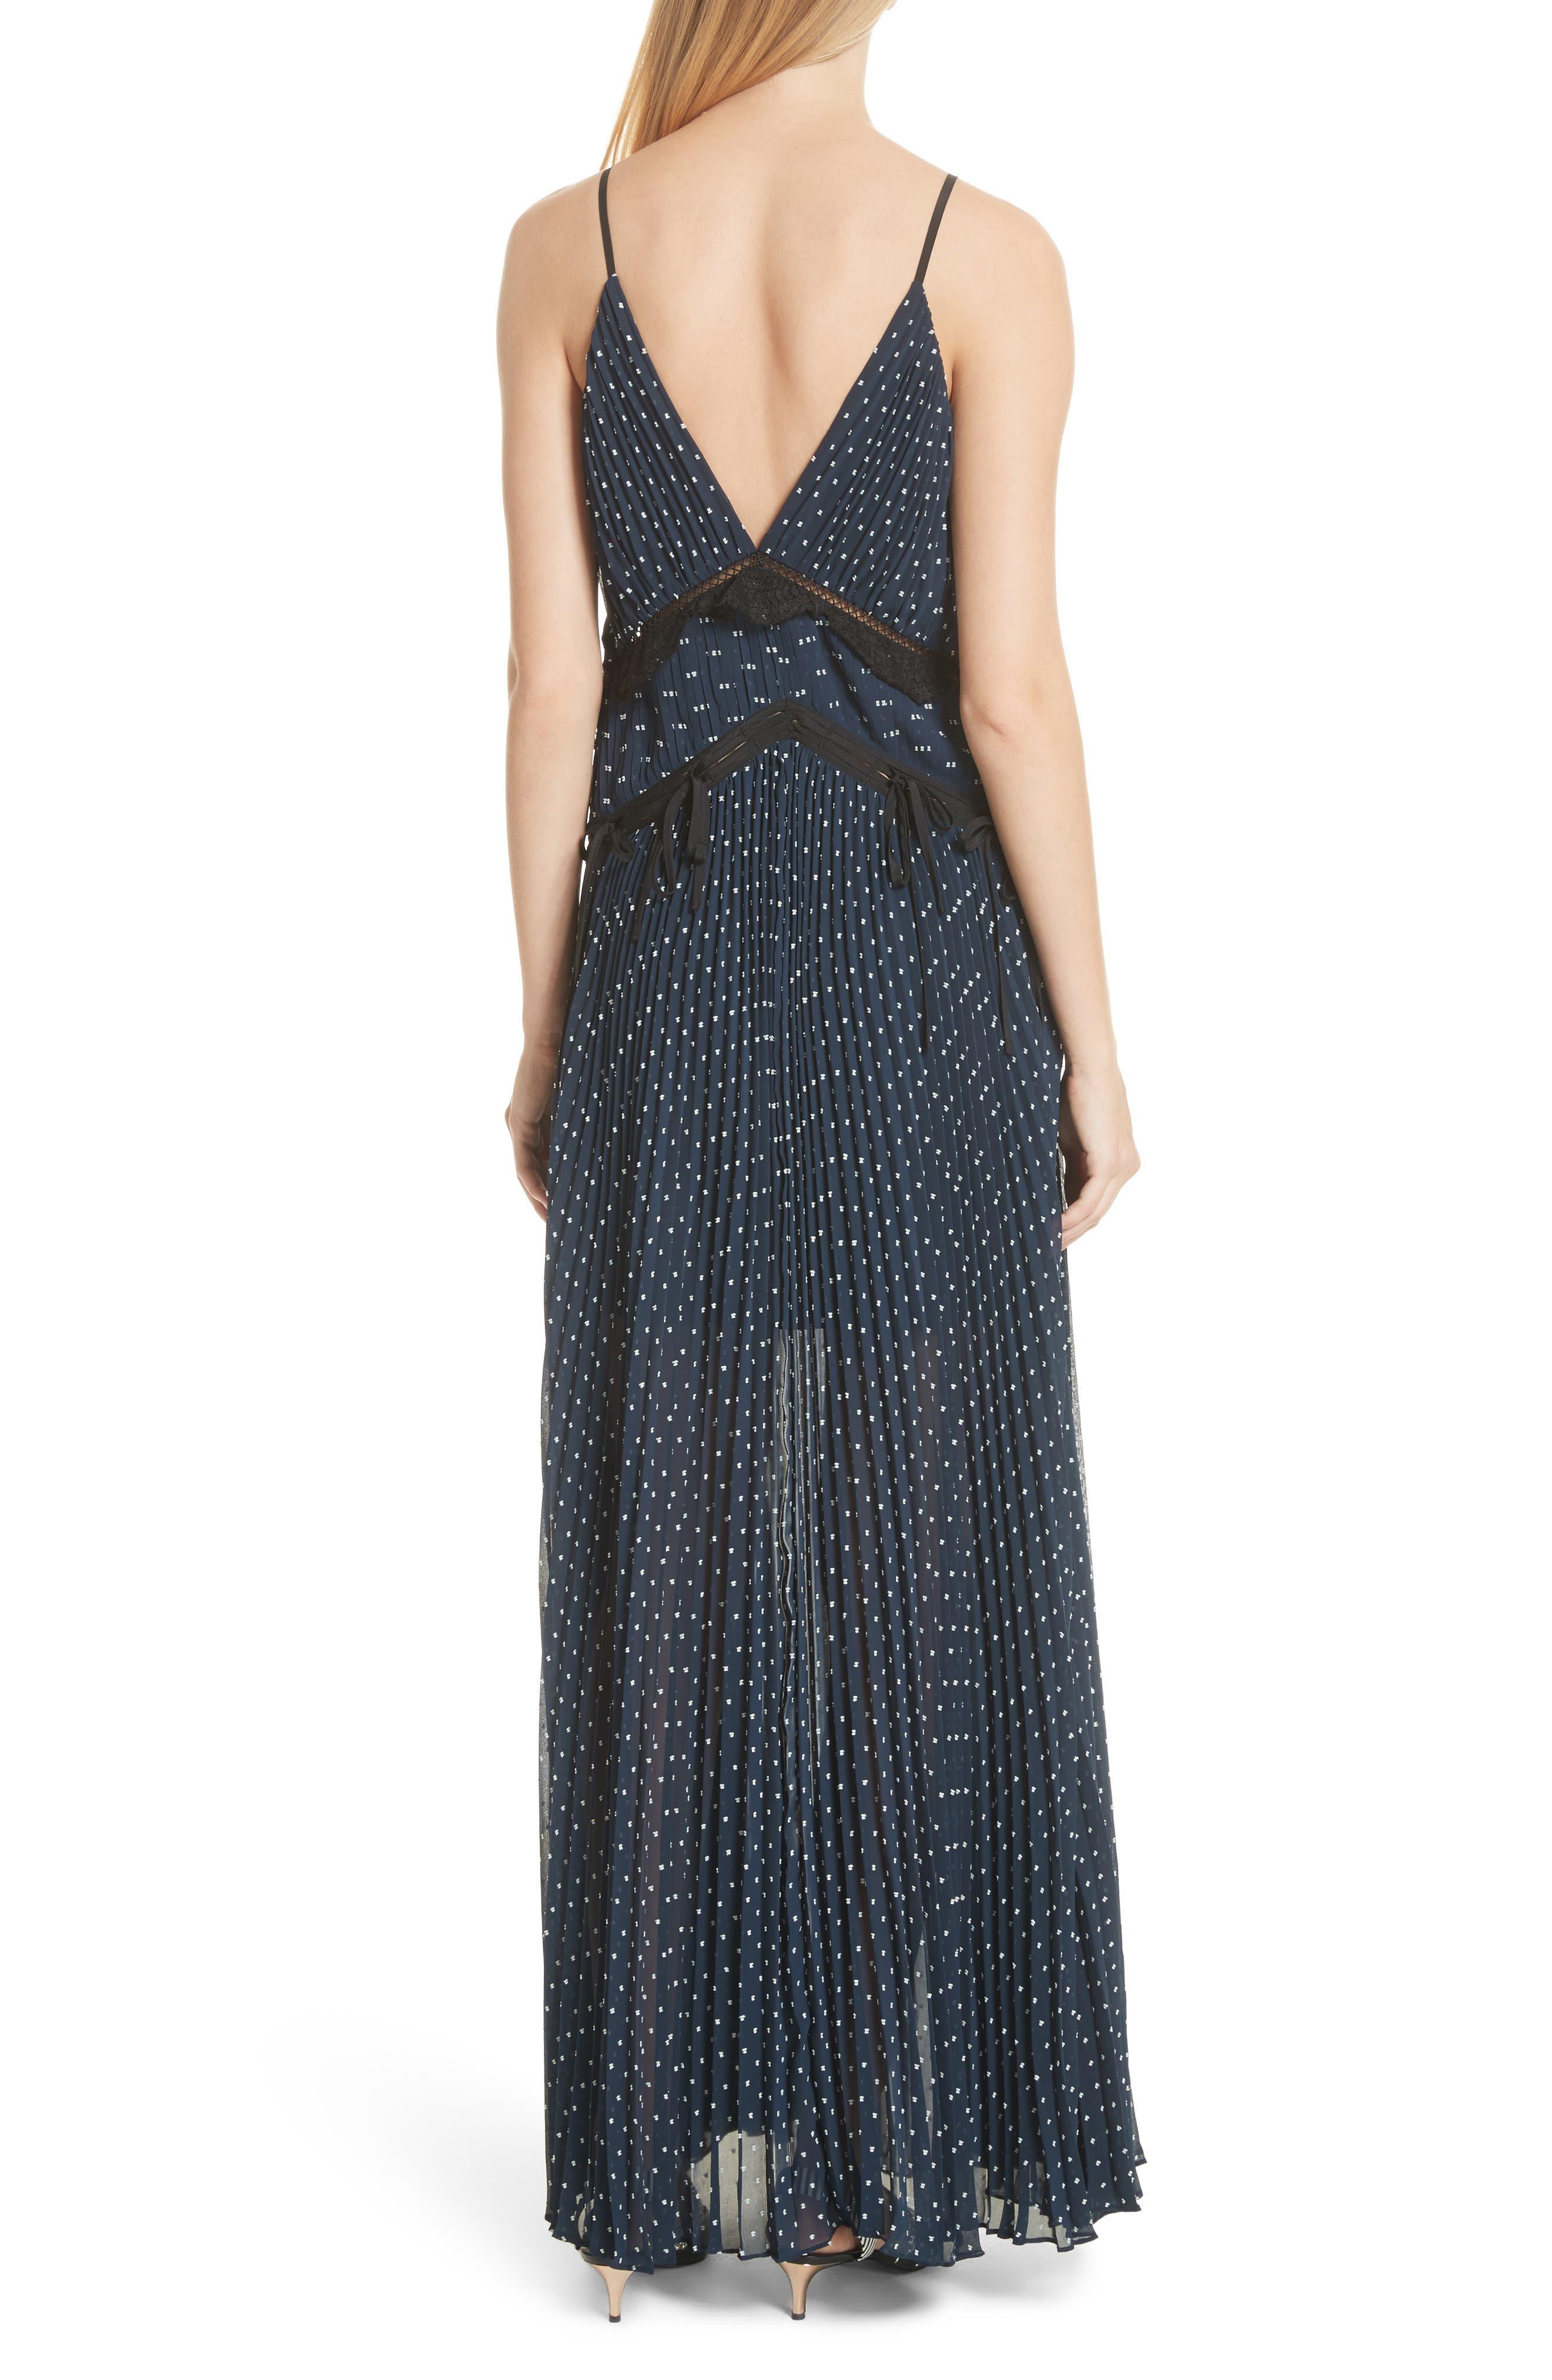 Plumetis Maxi Dress,                             Alternate thumbnail 2, color,                             400